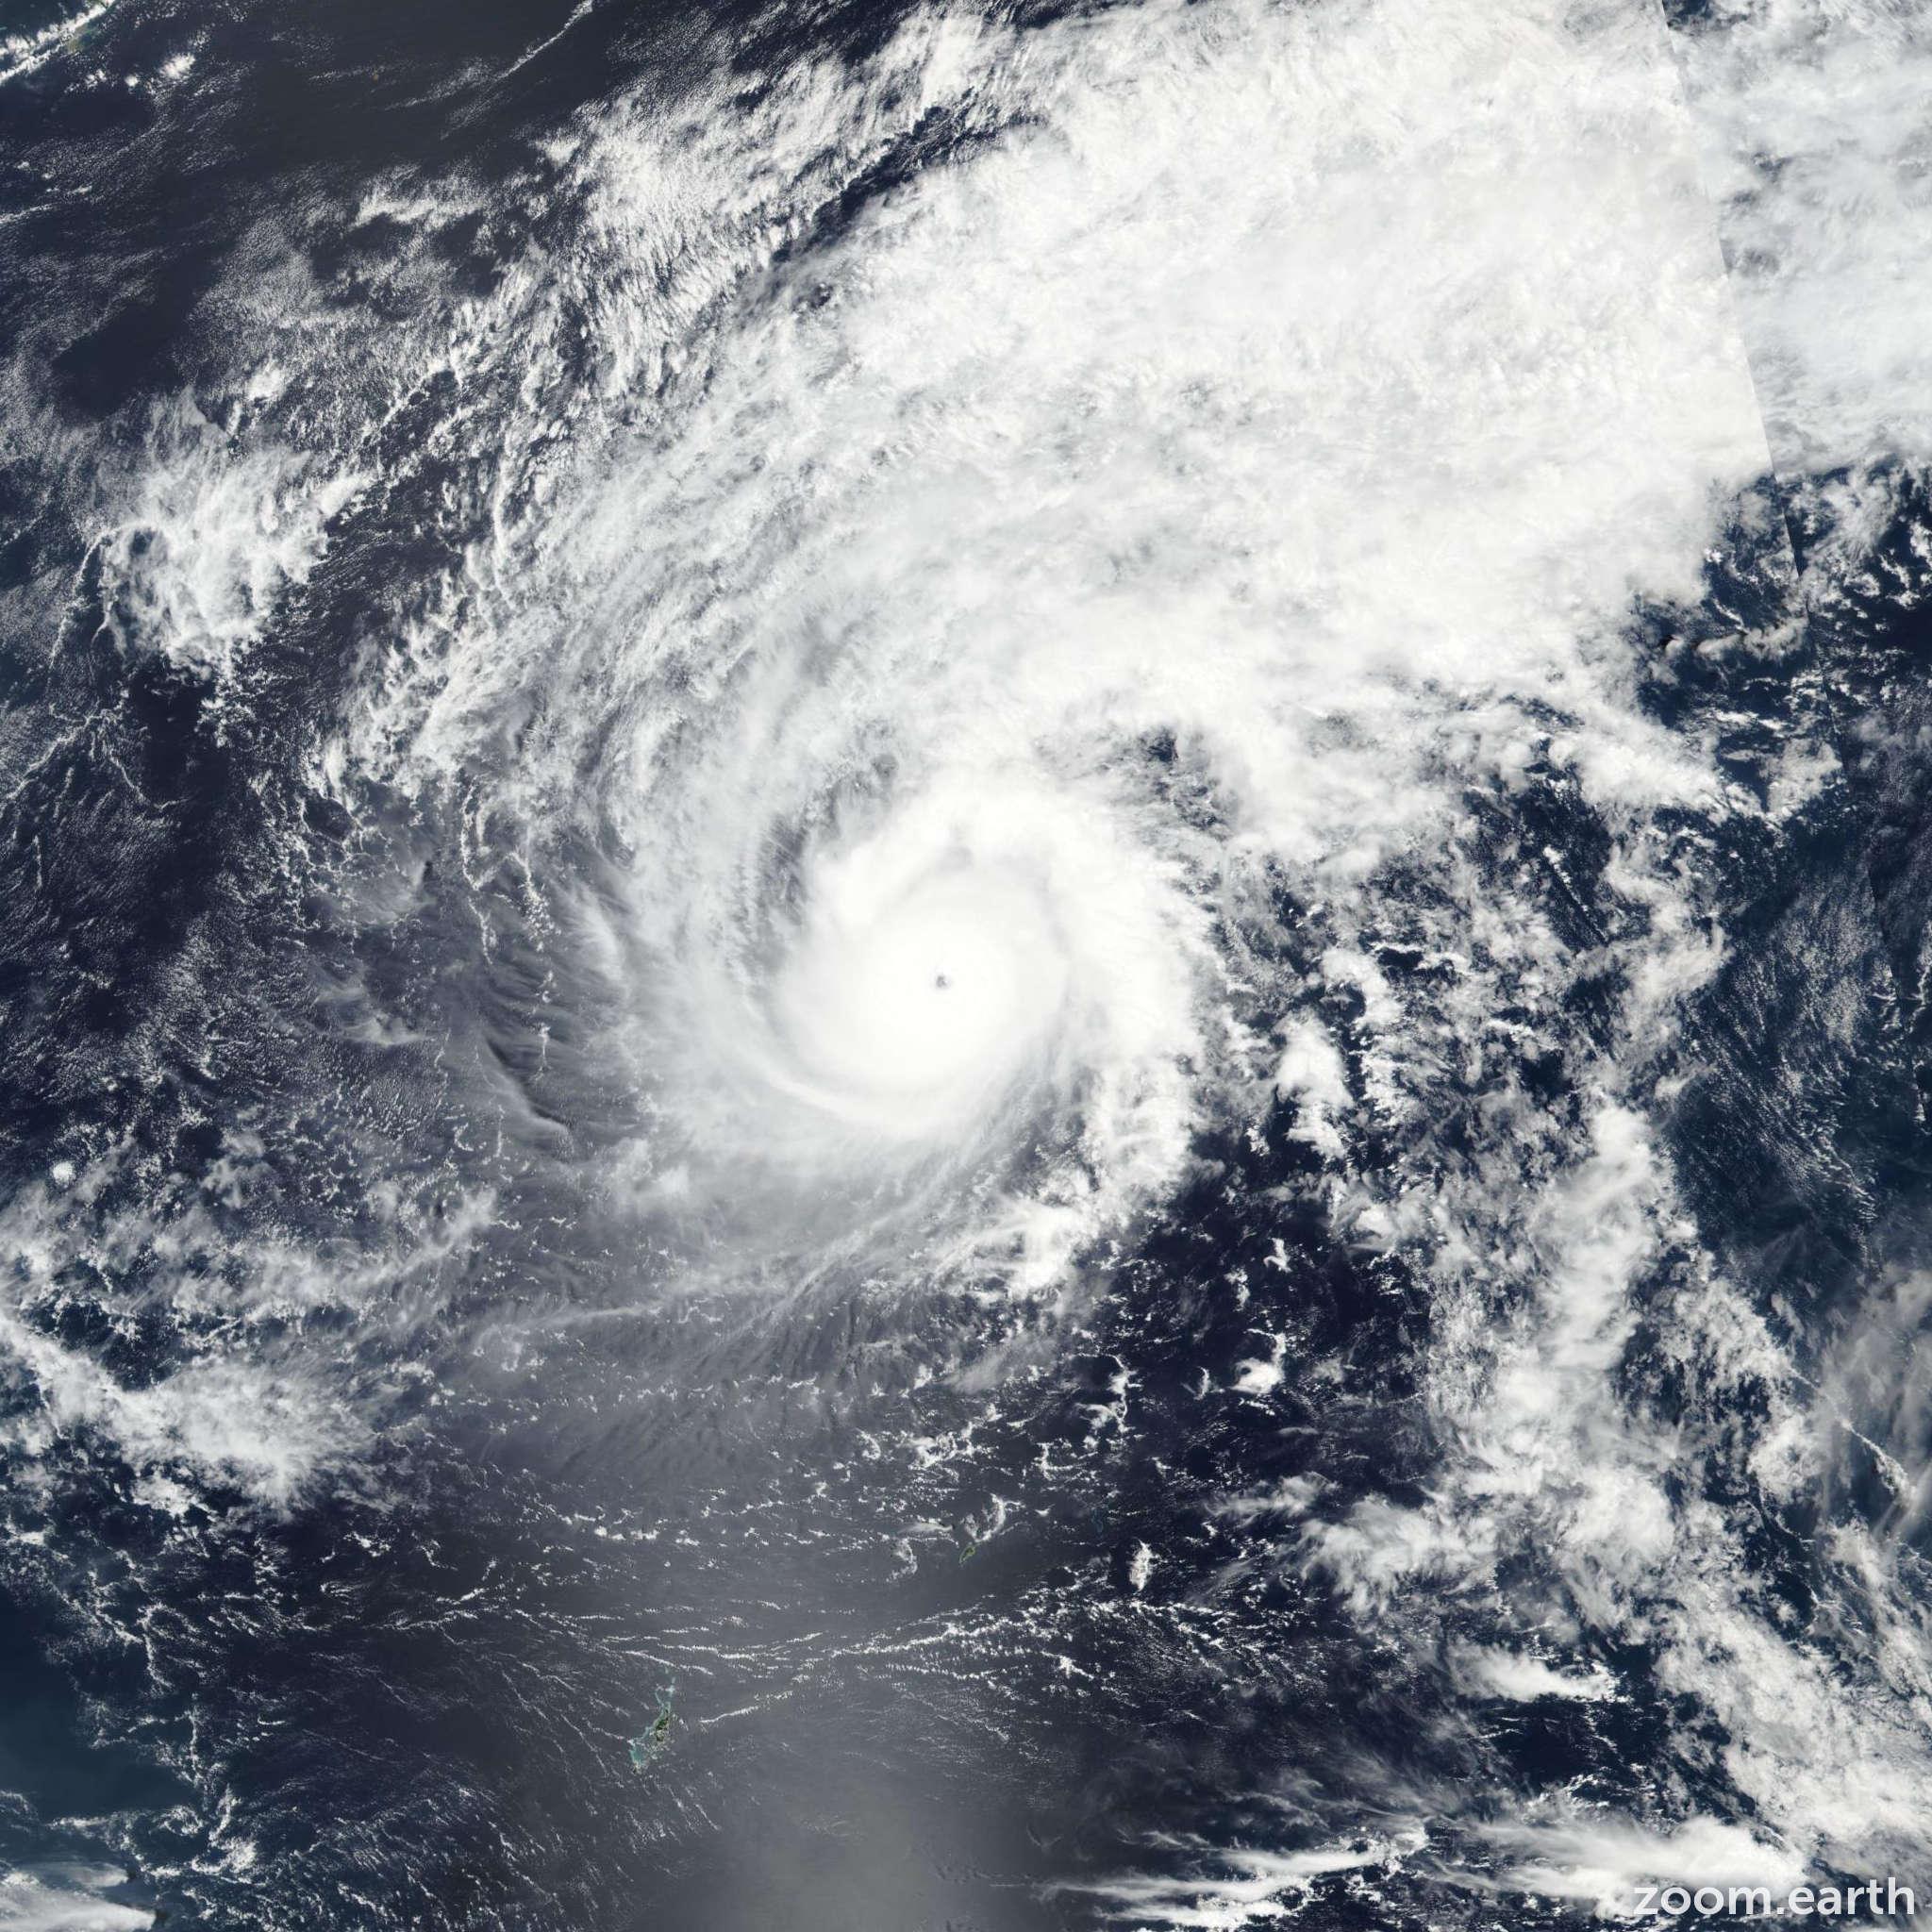 Satellite image of Typhoon Jelawat (Caloy) 2018